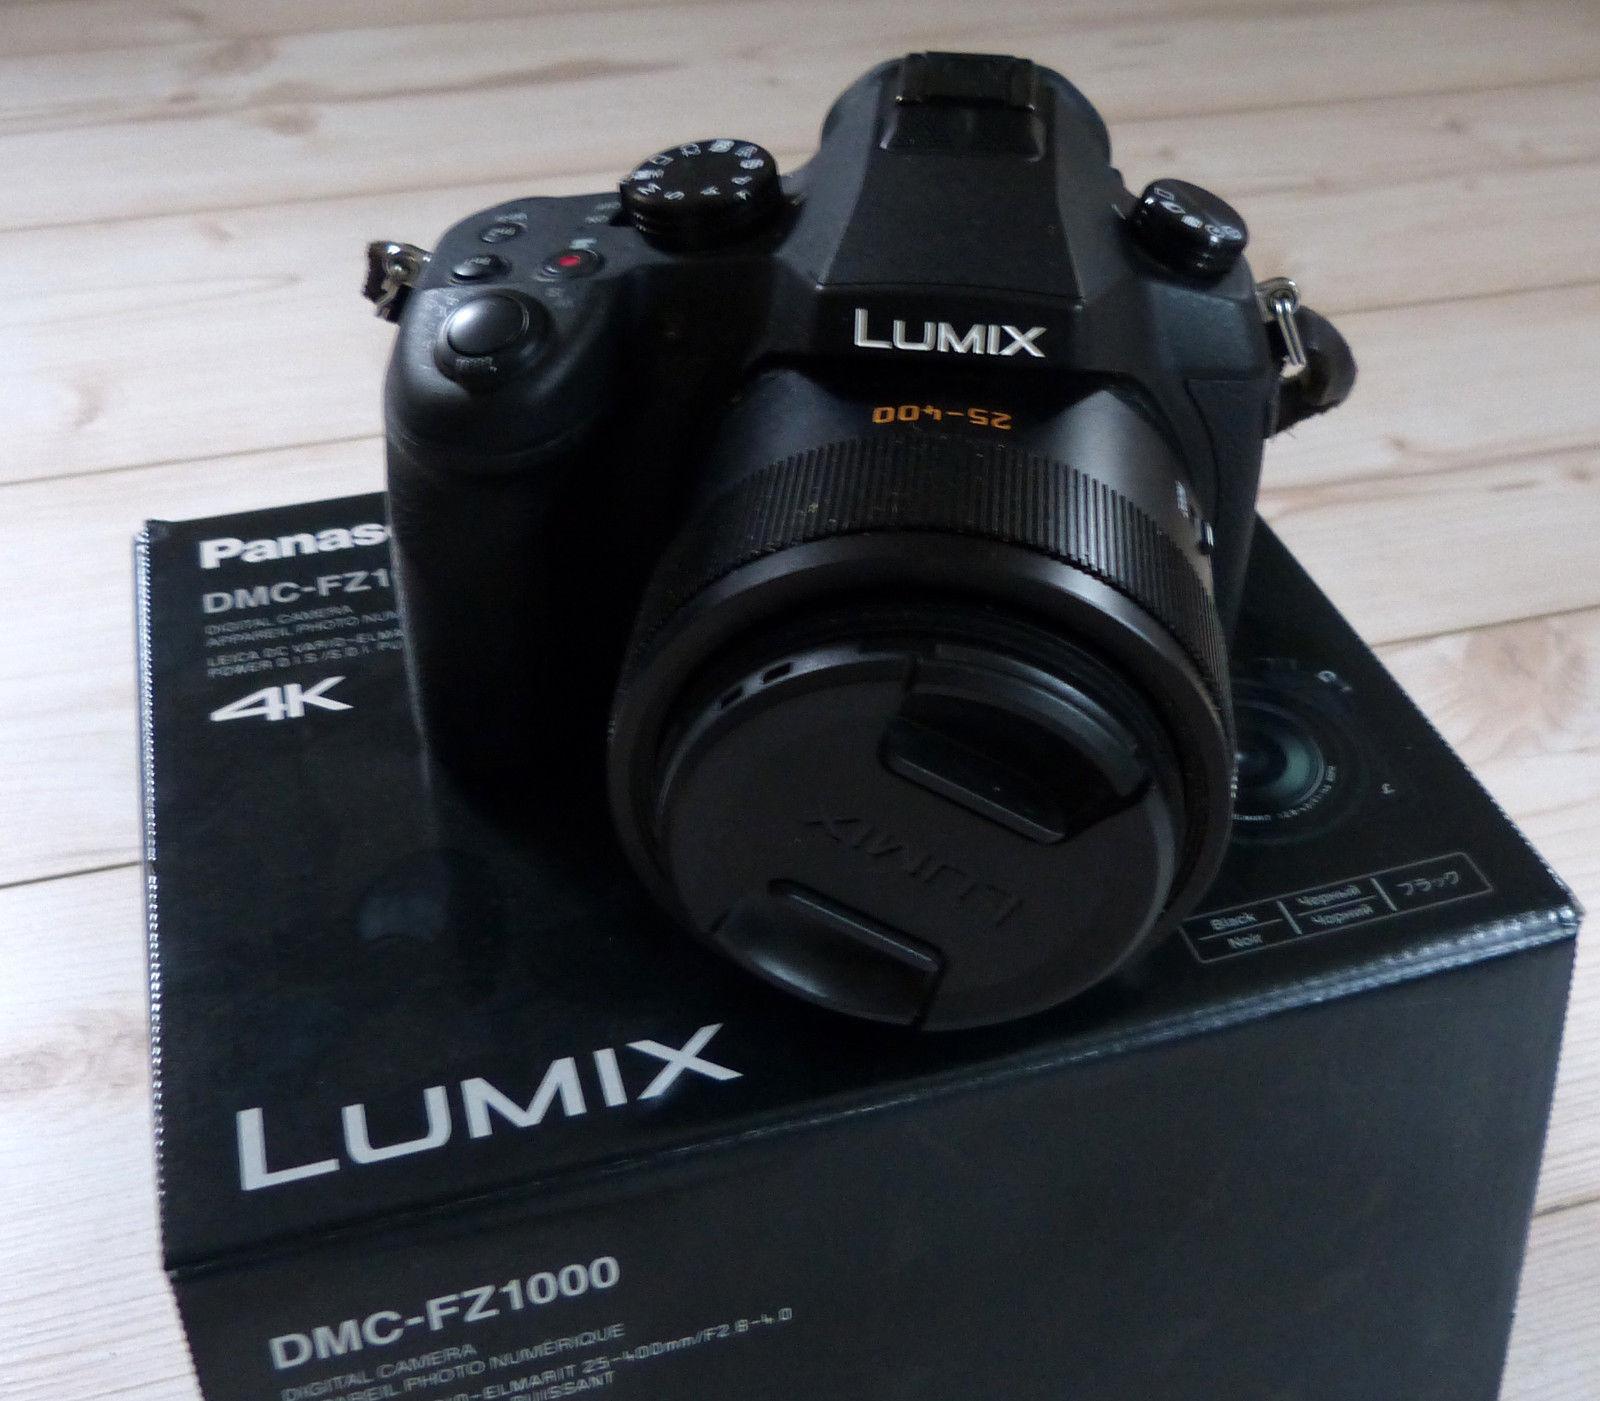 Panasonic LUMIX DMC-FZ1000 20.1 MP Digitalkamera +extras ( manfrotto tripod u.a)